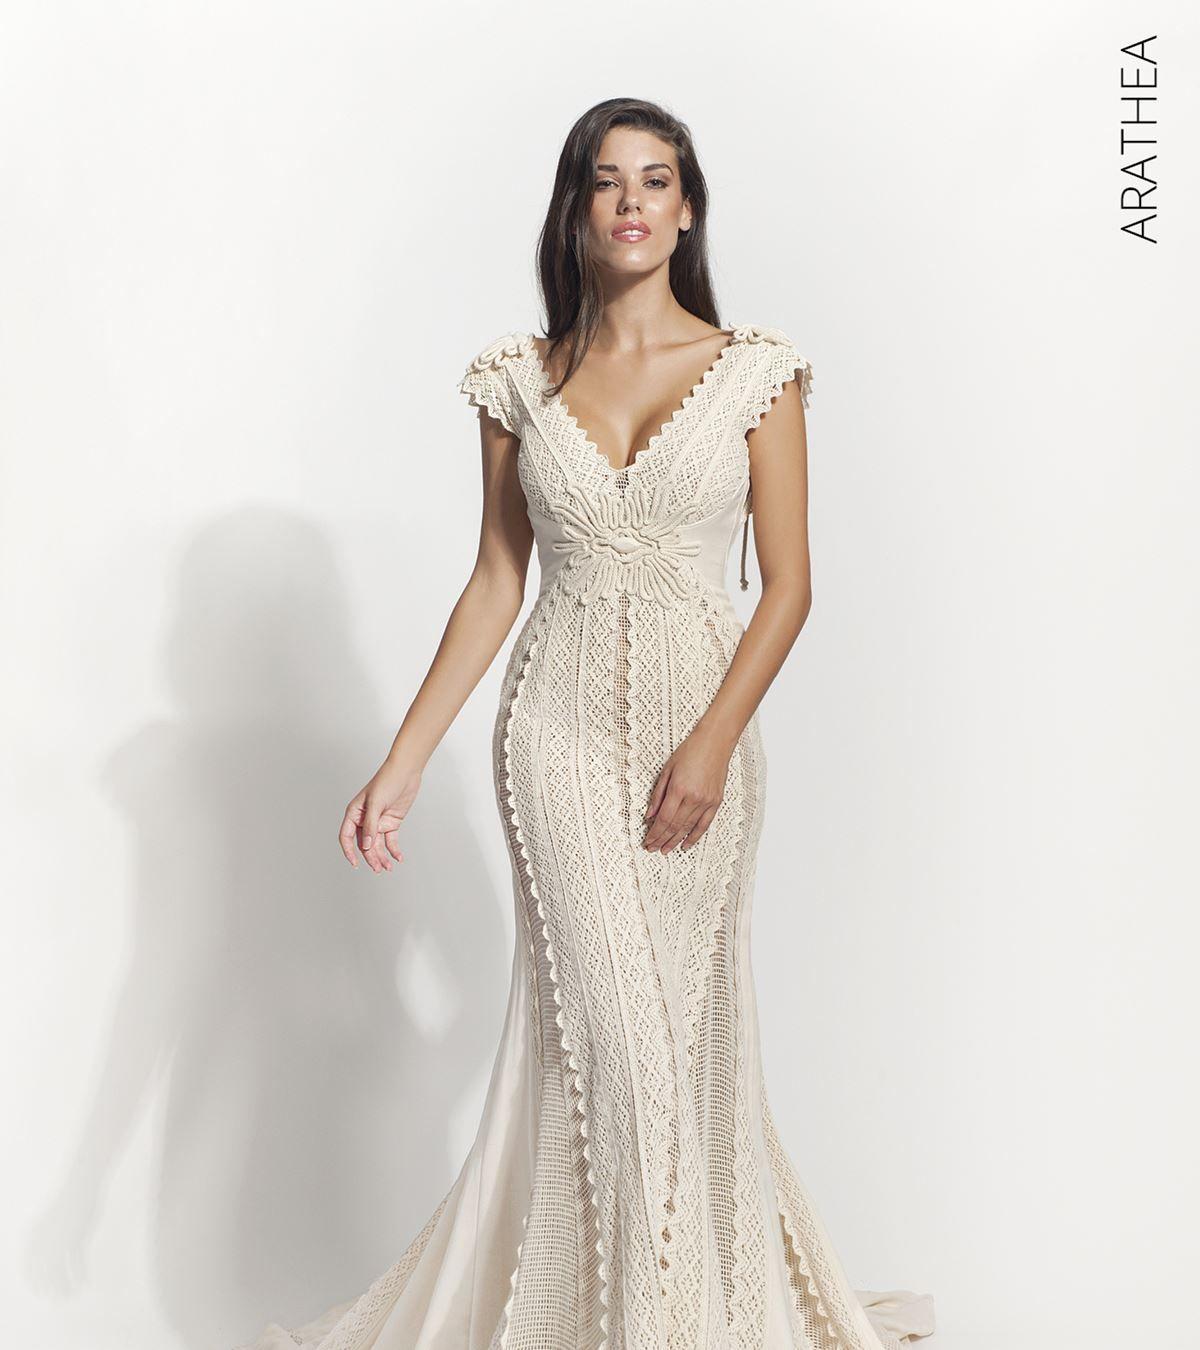 Zolotas Australia Bridal Wear   Wedding Dresses   Easy Weddings ...